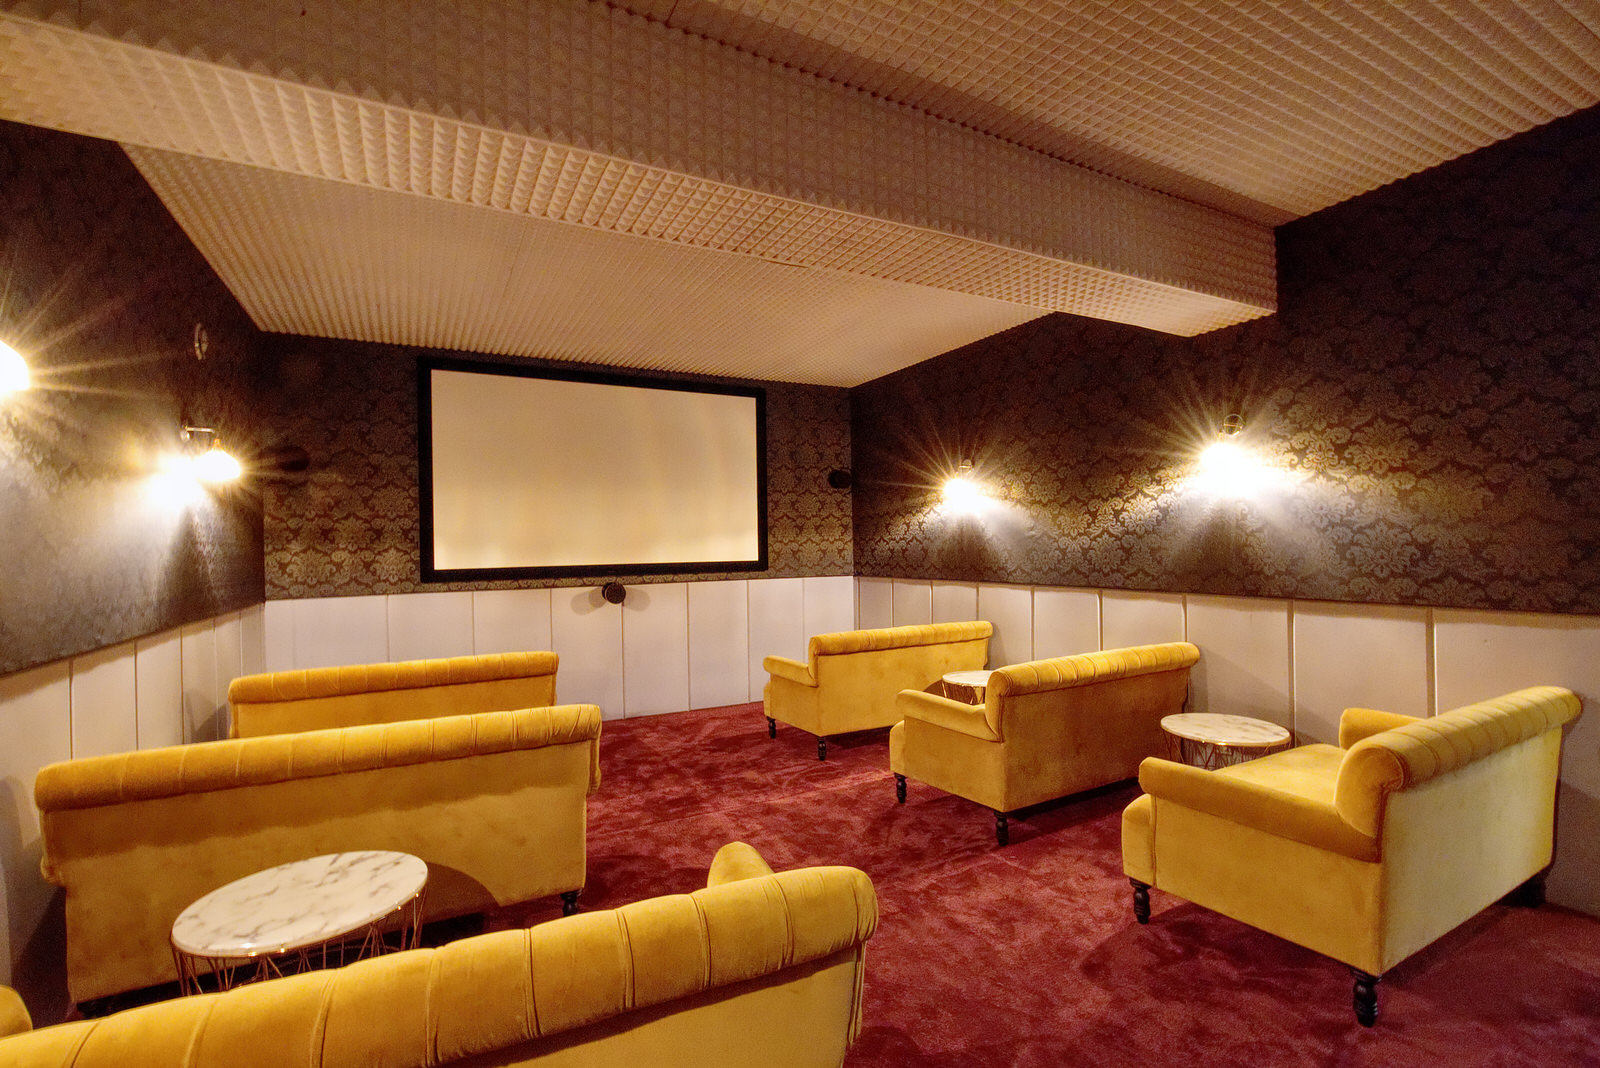 Salle de projection - Cinema - Coworking space